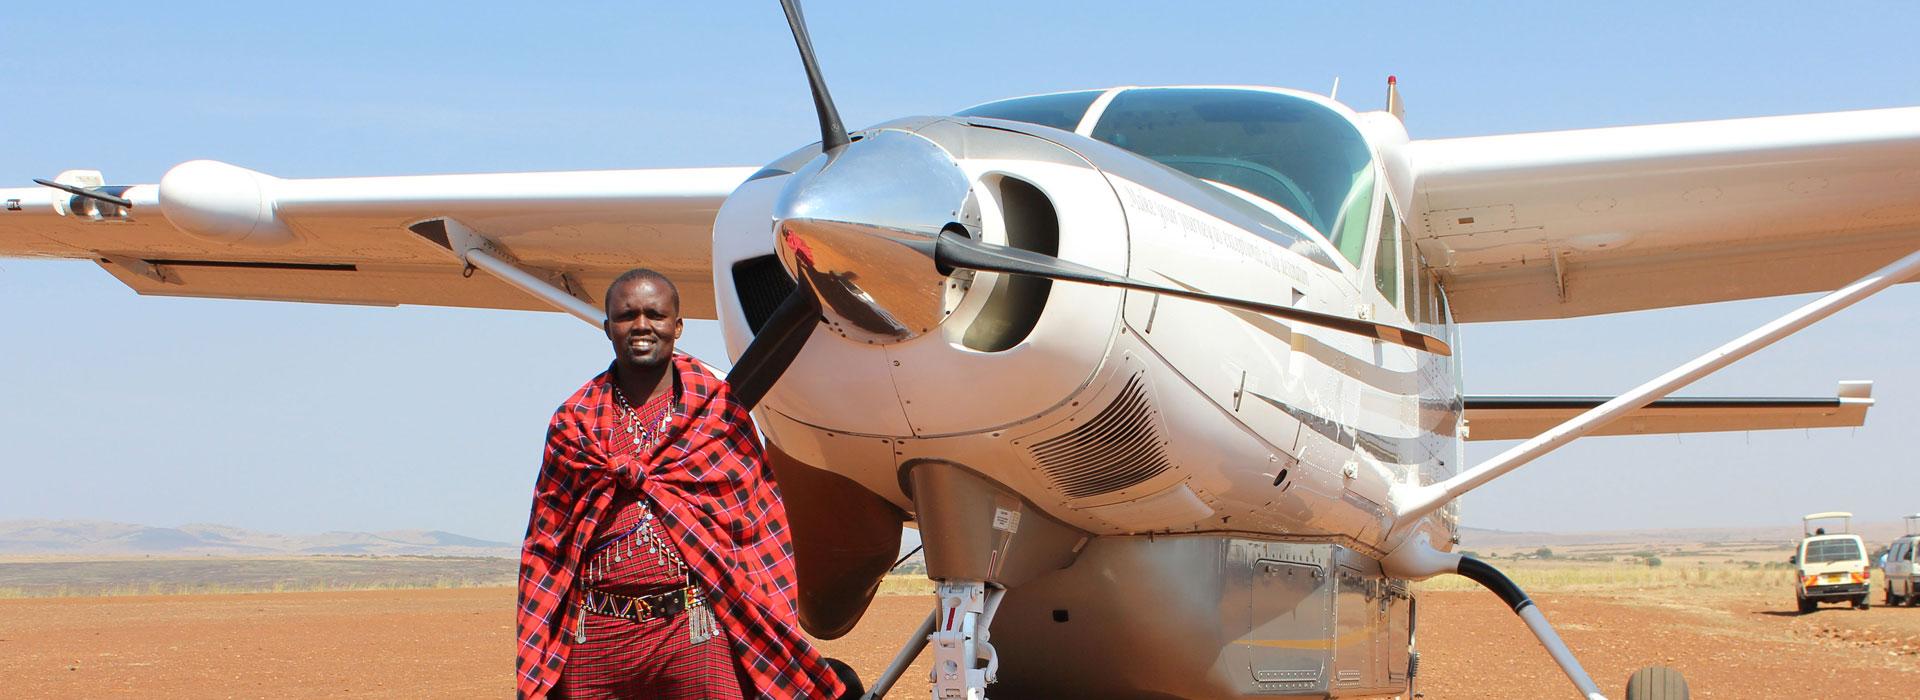 3 Days Wildebeest Migration Safari in Masai Mara from Nairobi by Air